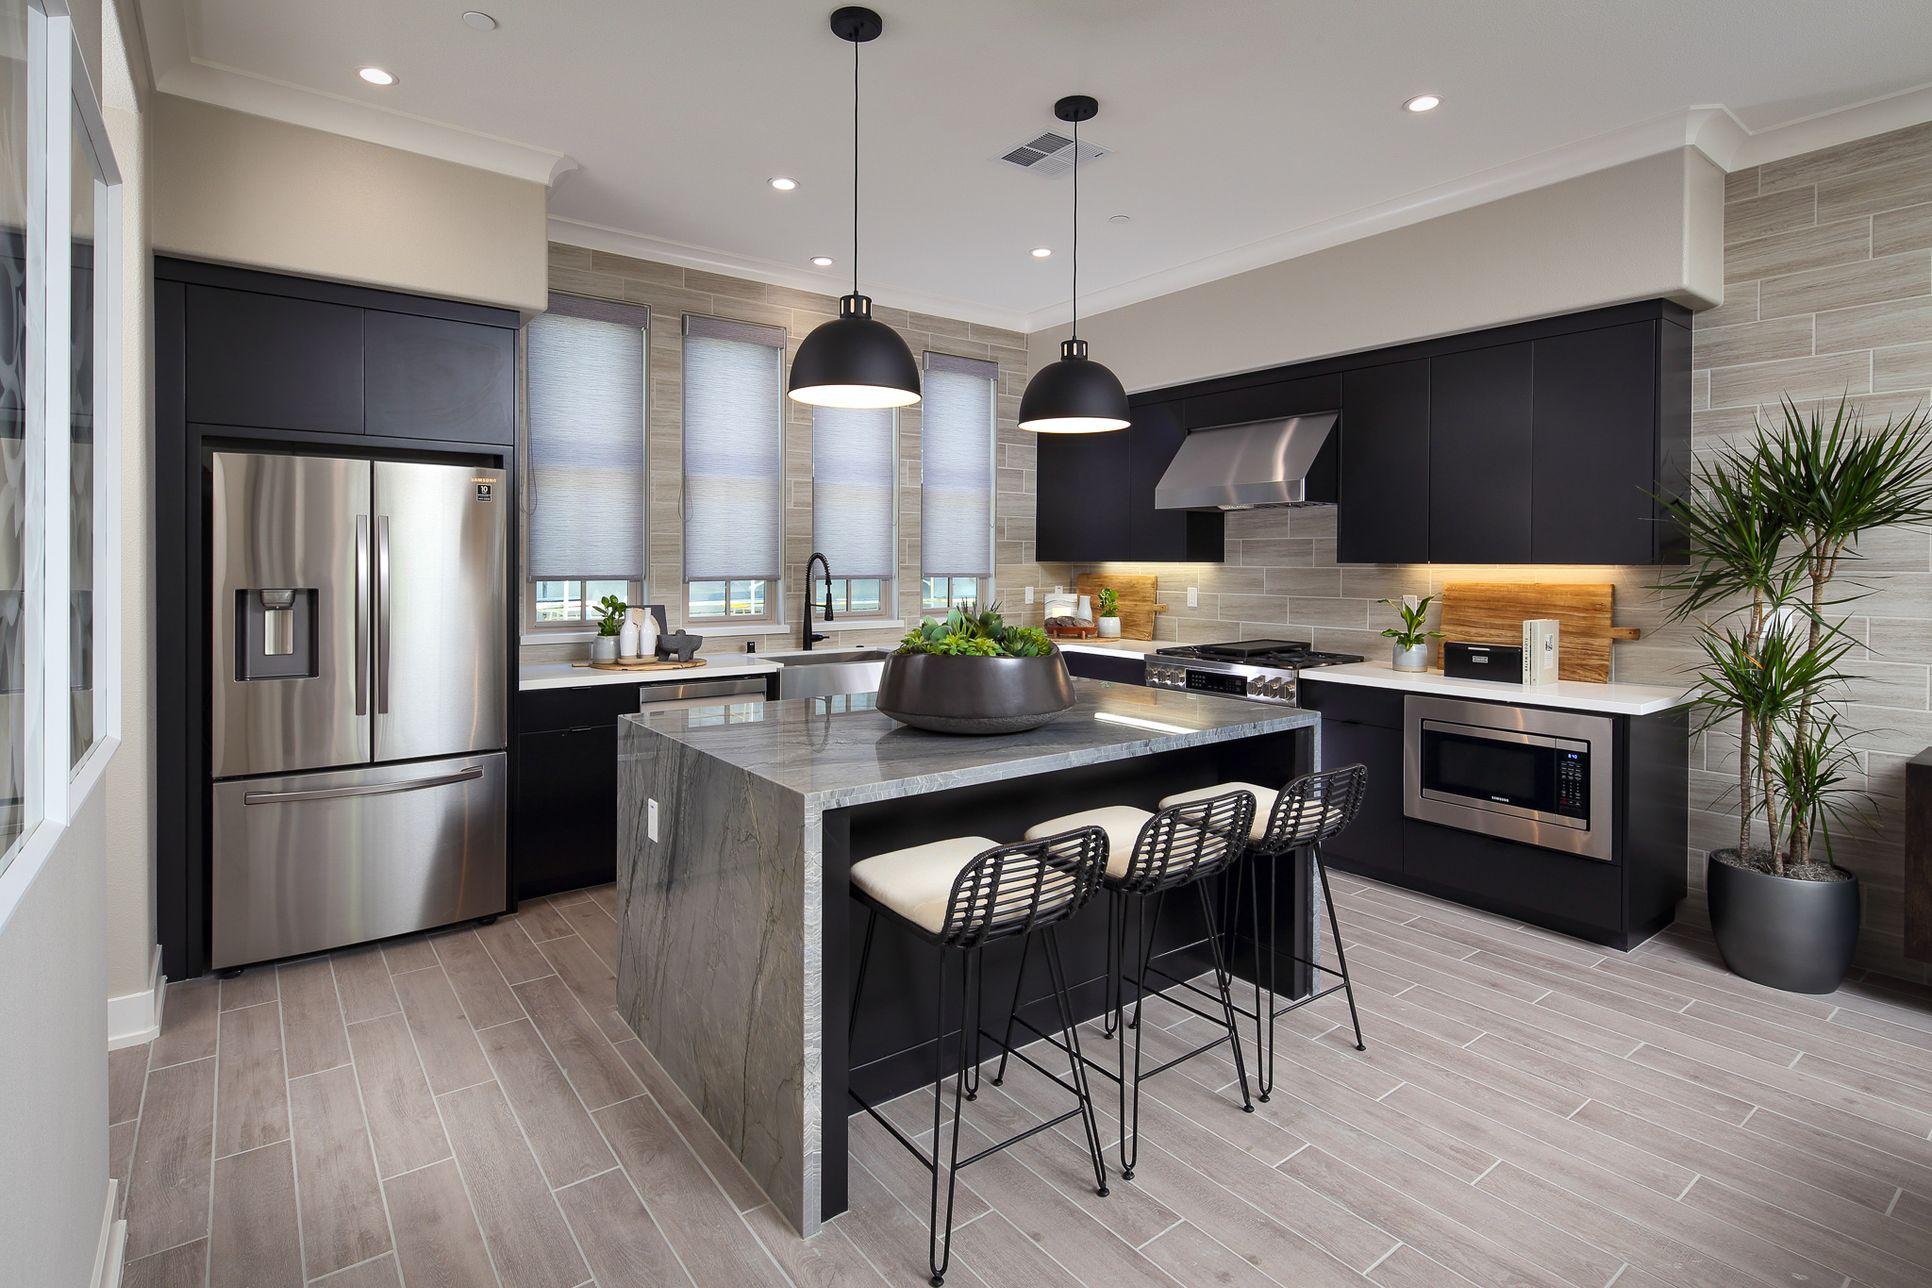 Plan 2 Kitchen:Gourmet Appliances